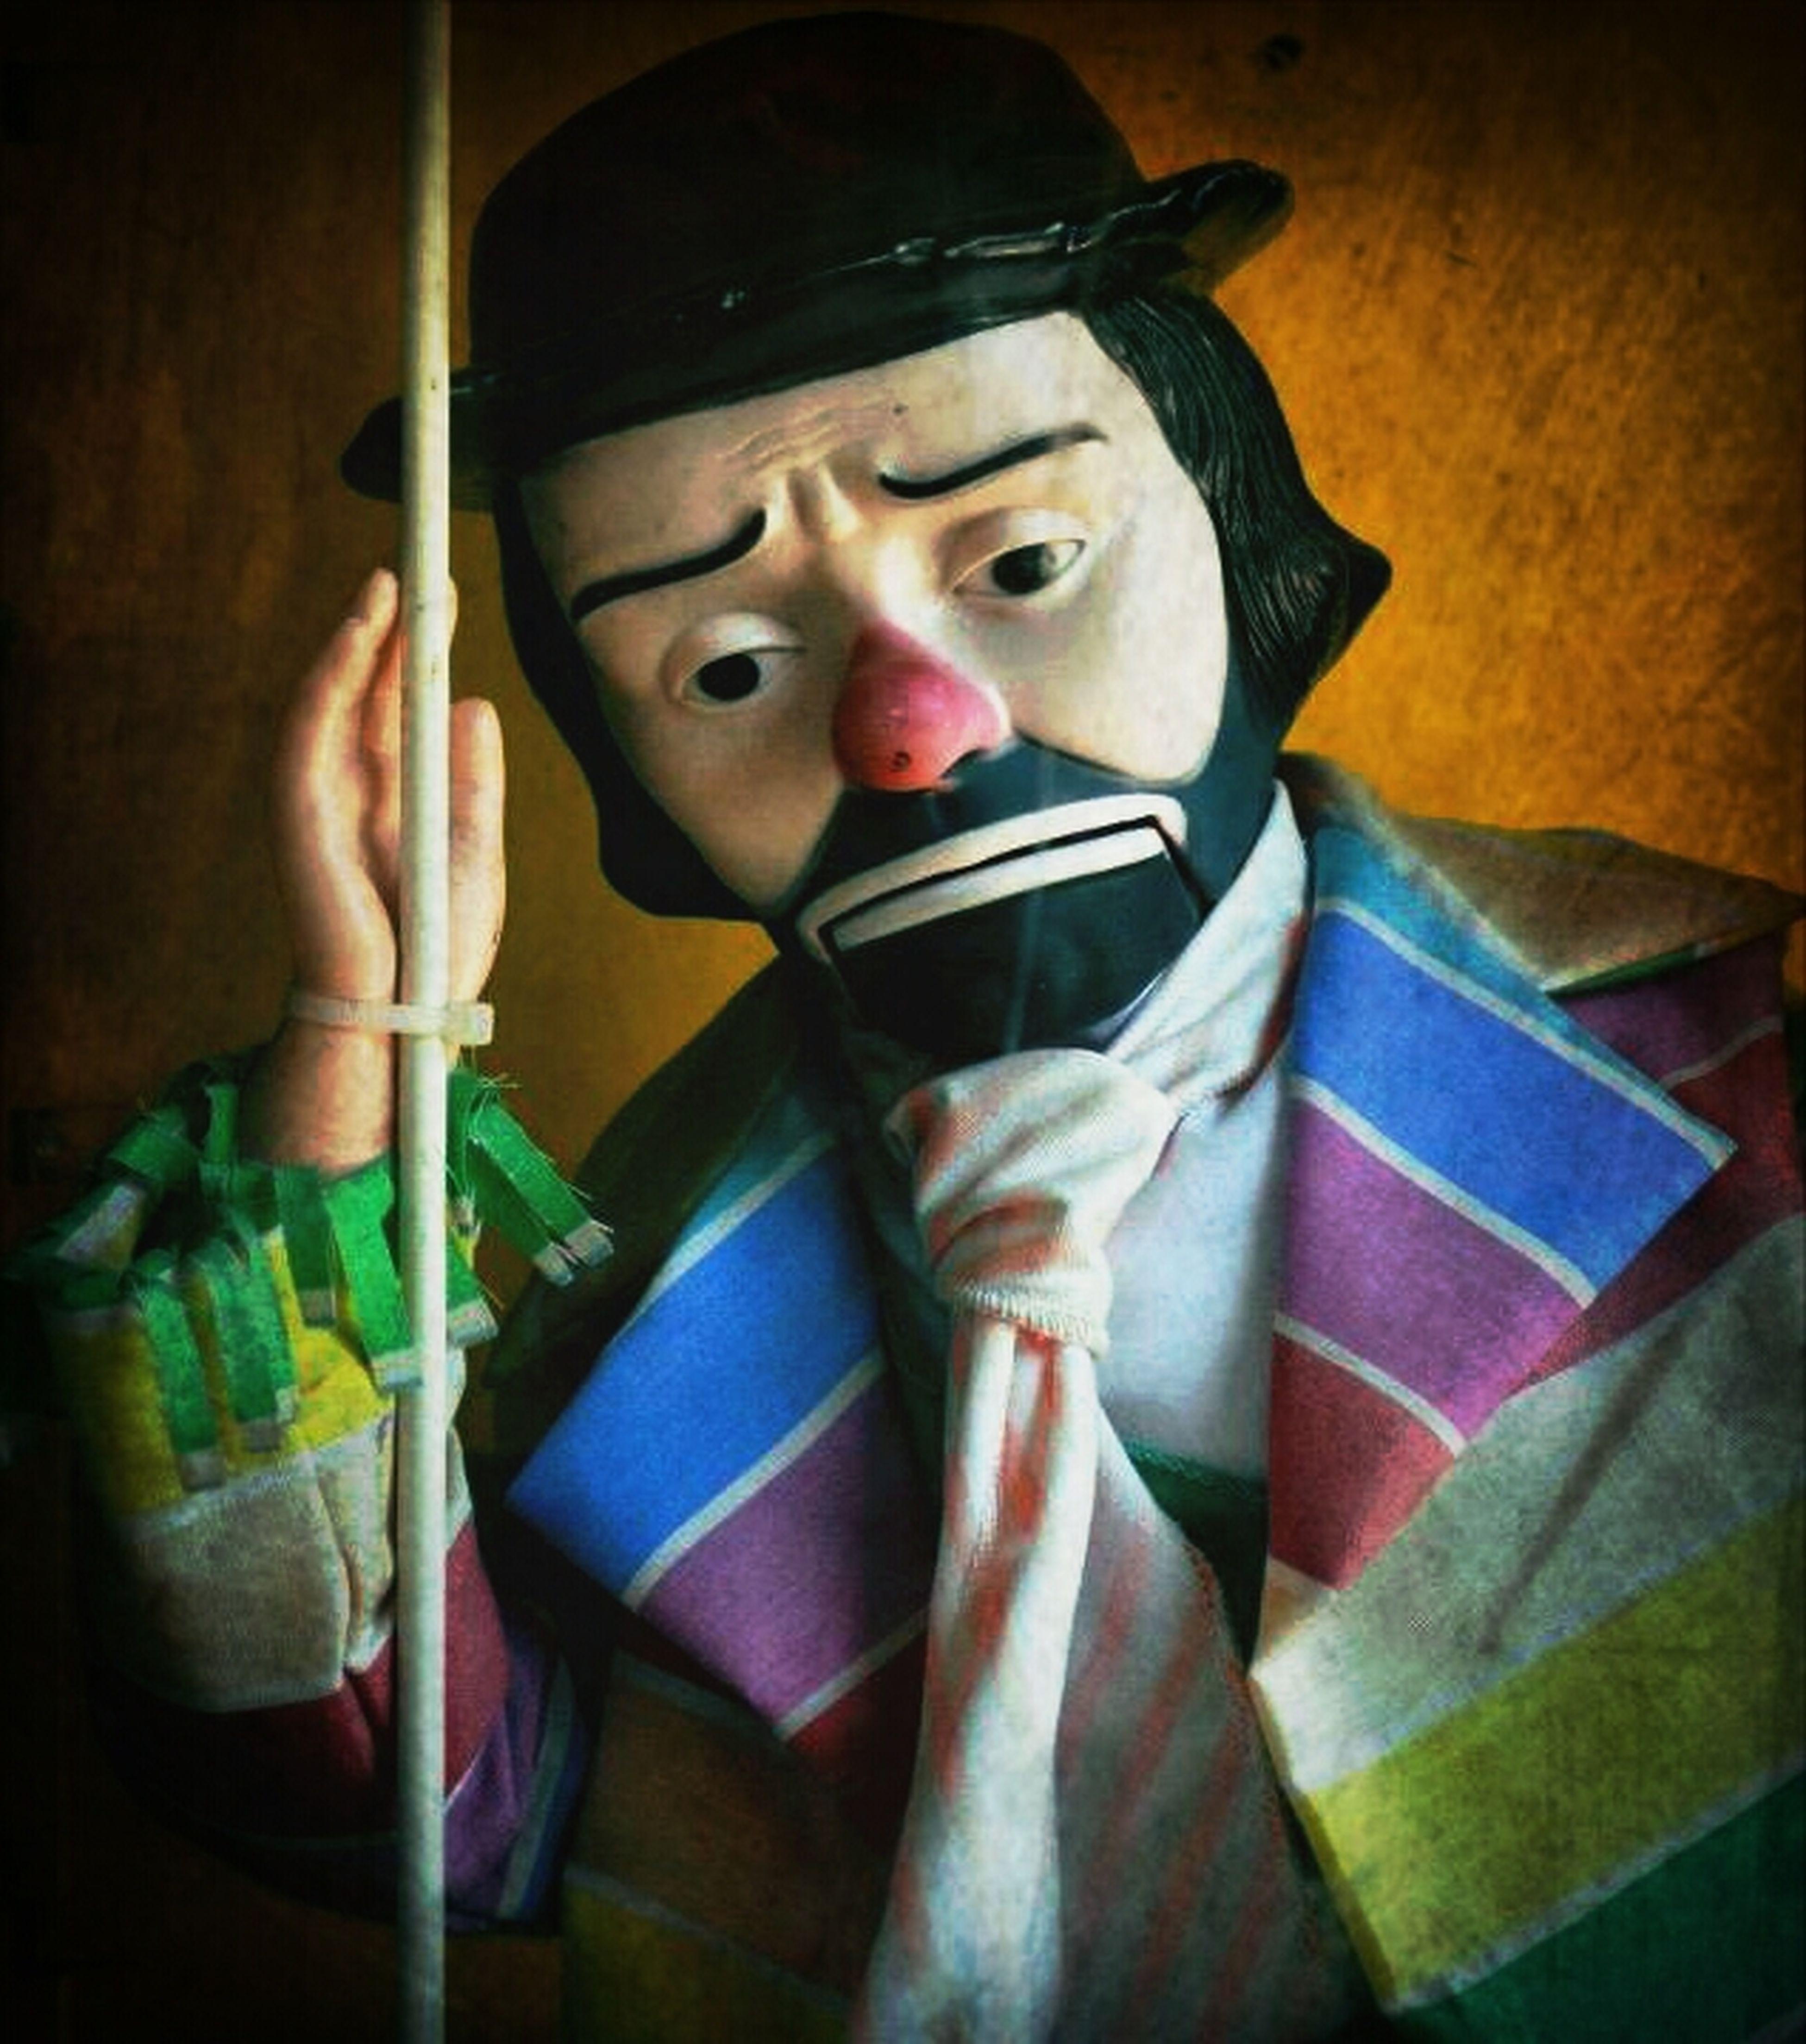 I Hate Clowns